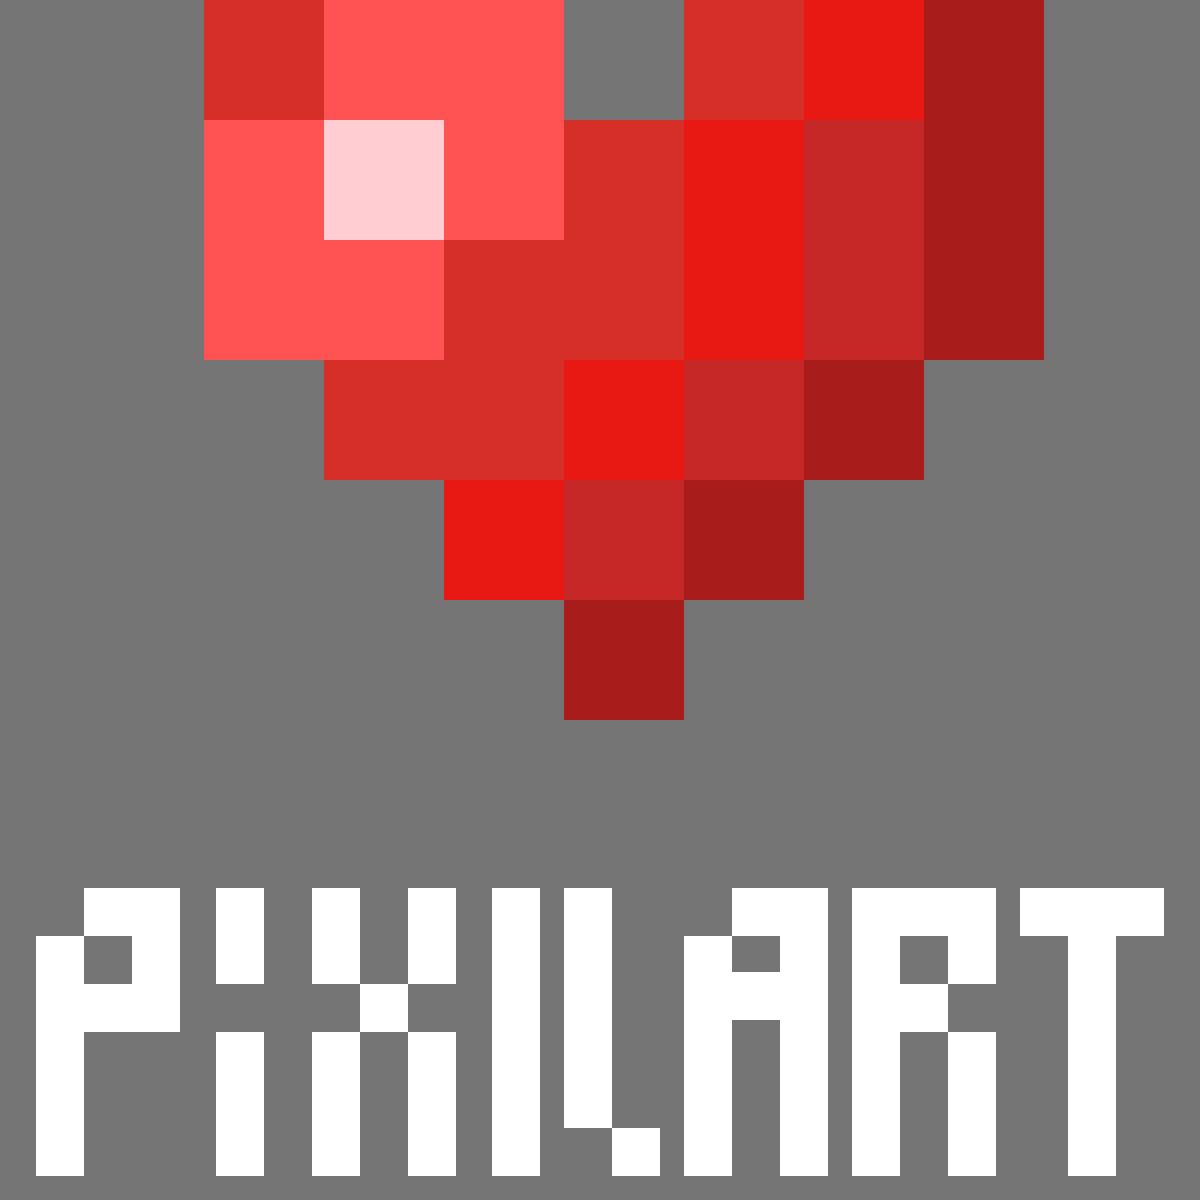 Pixilart by Bobbydinkolson